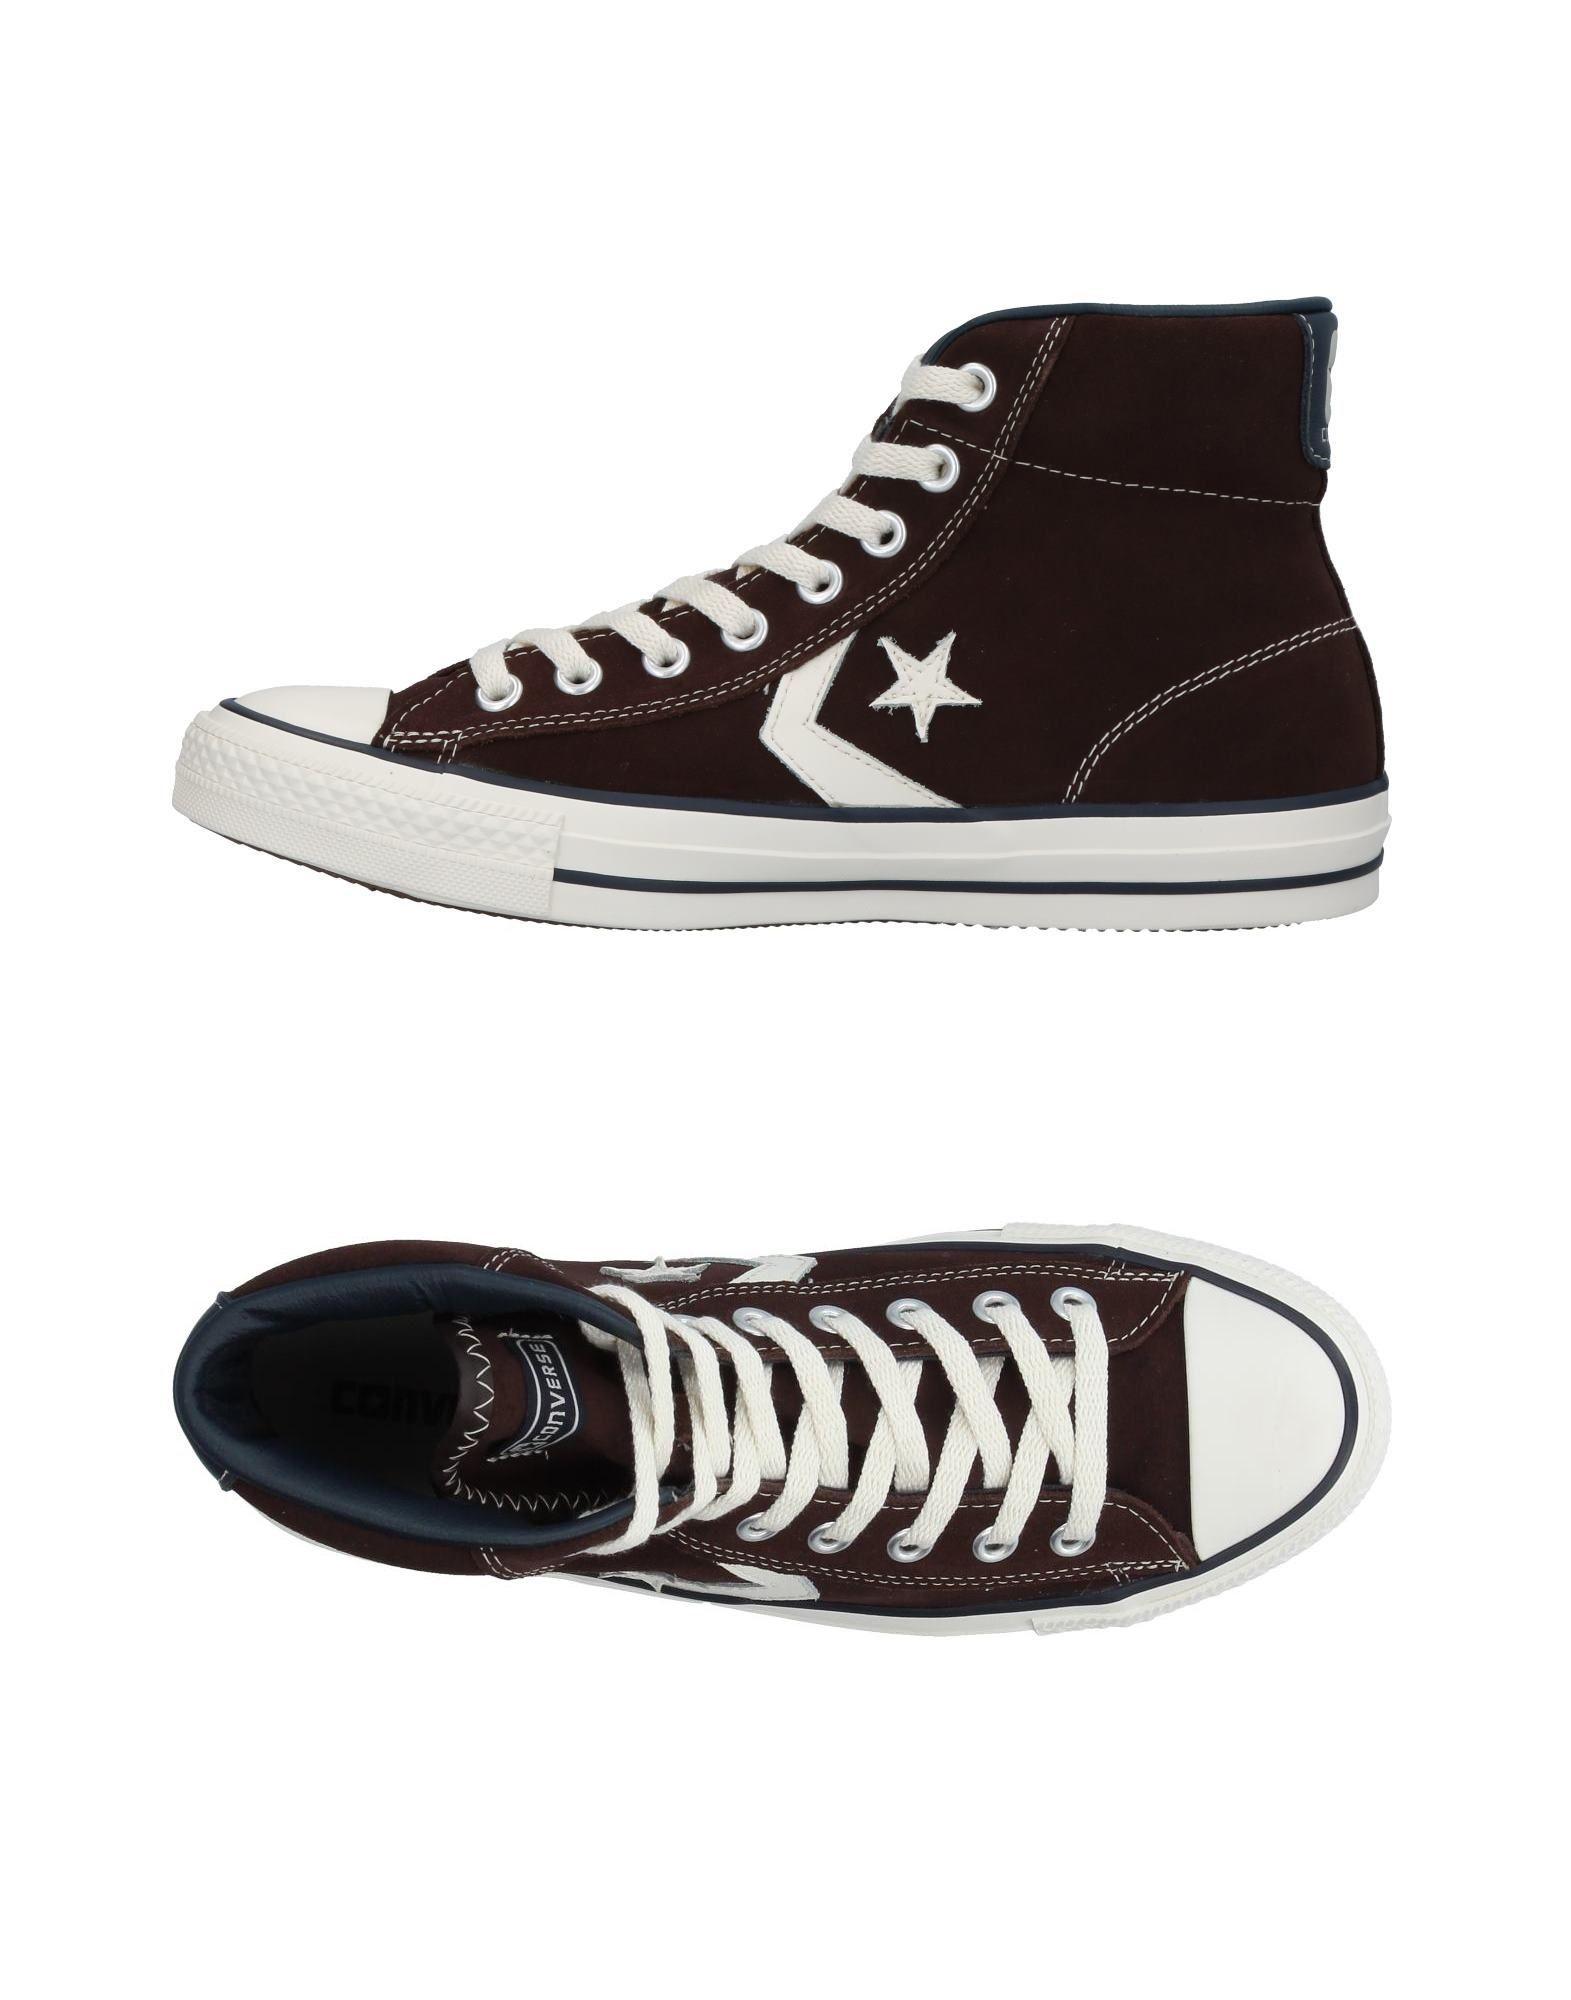 Sneakers Converse Homme - Sneakers Converse sur